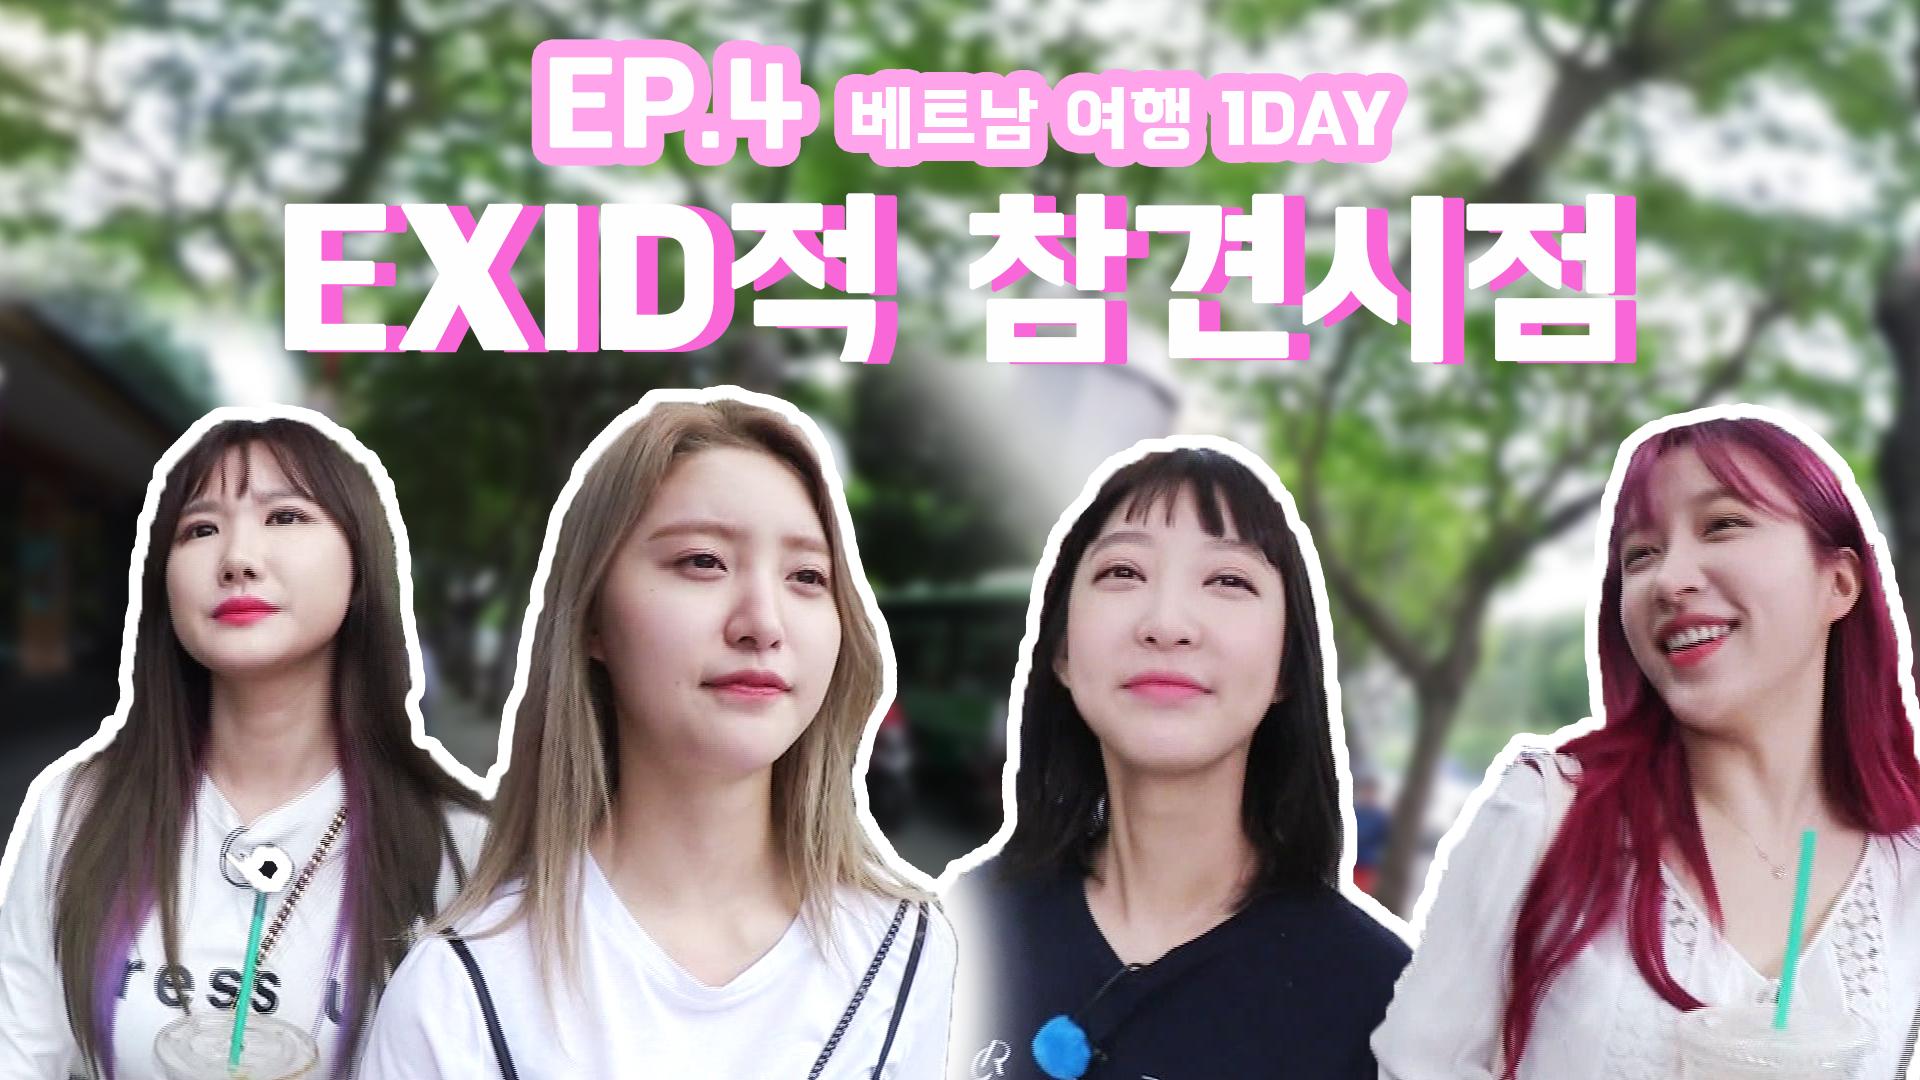 [MADE IN EXID] EXID EP04. 베트남 여행1DAY EXID적 참견시점